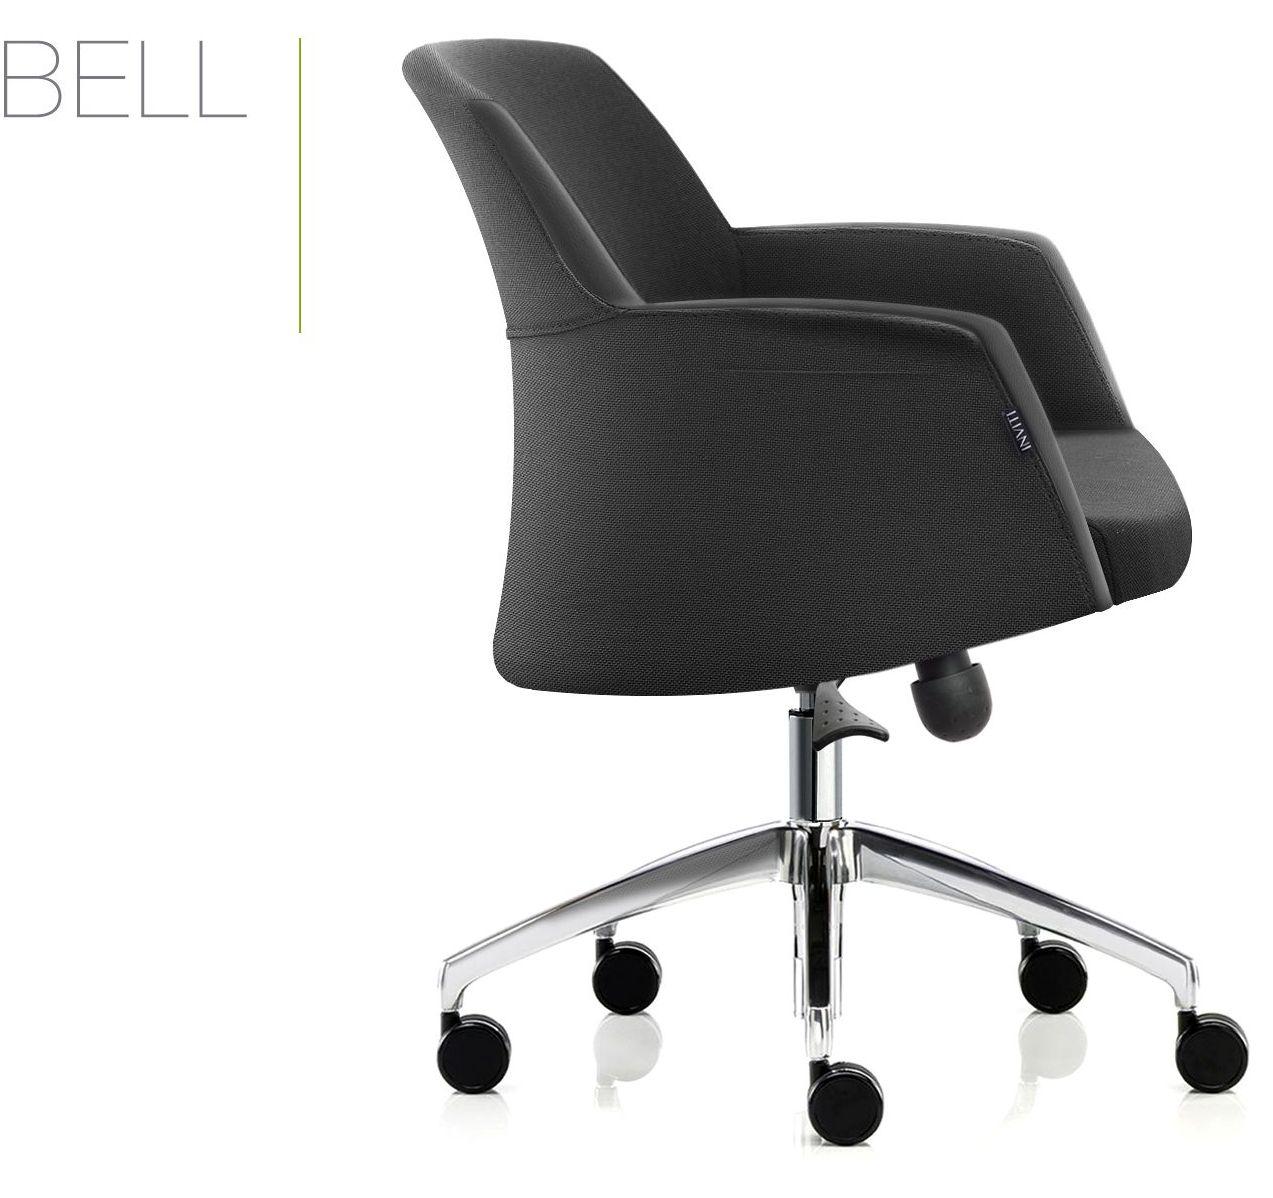 Kursi Kantor Inviti Bell Series